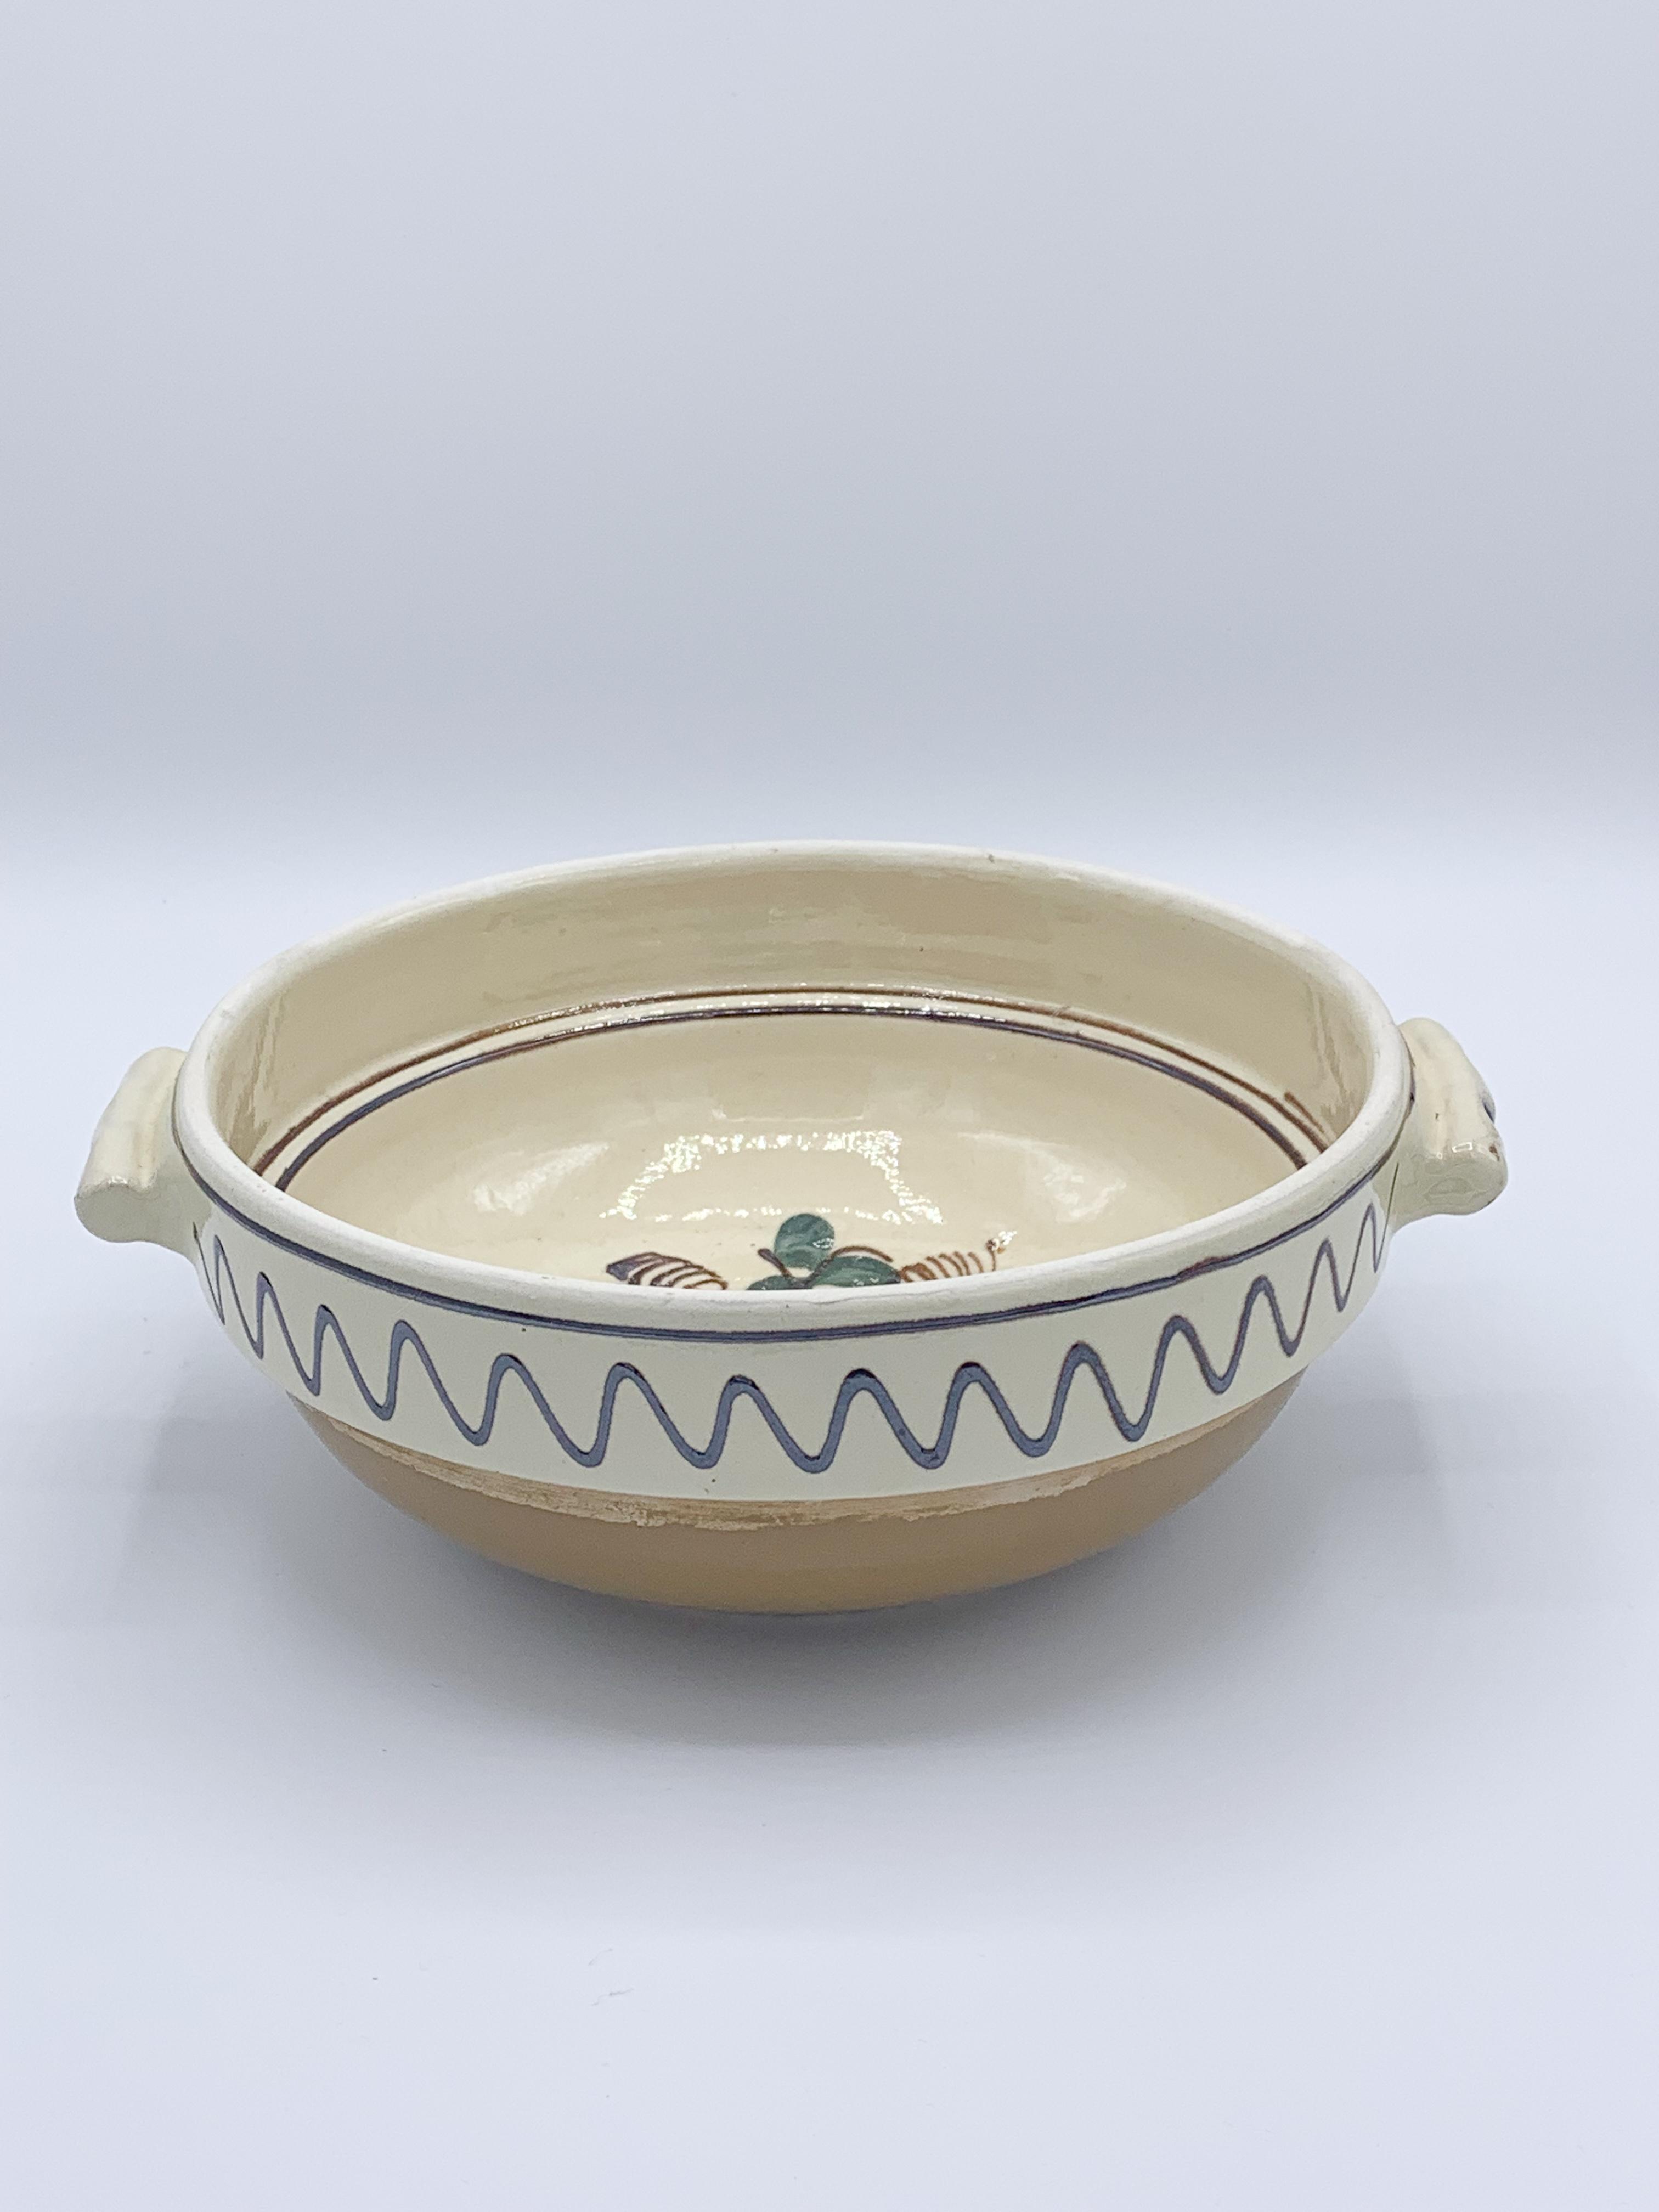 Castron traditional din ceramica de corund [3]